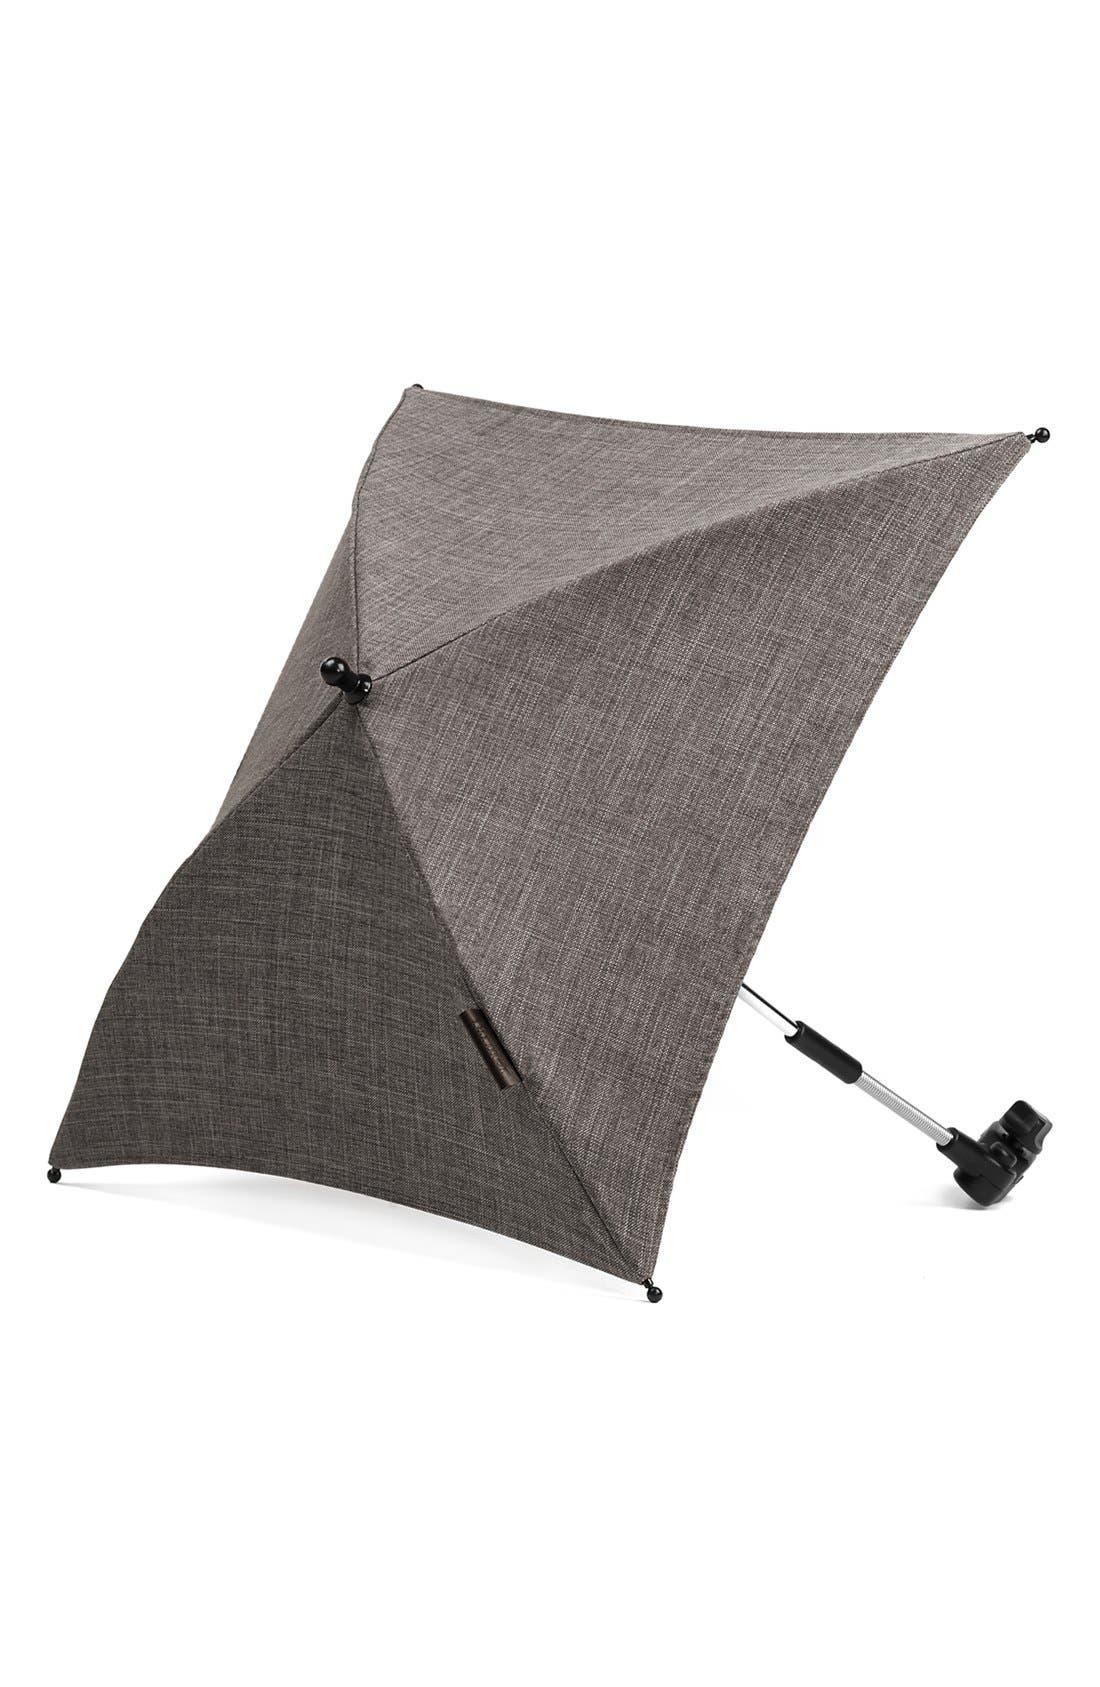 'Evo - Famer Earth' Stroller Umbrella,                         Main,                         color, Brown